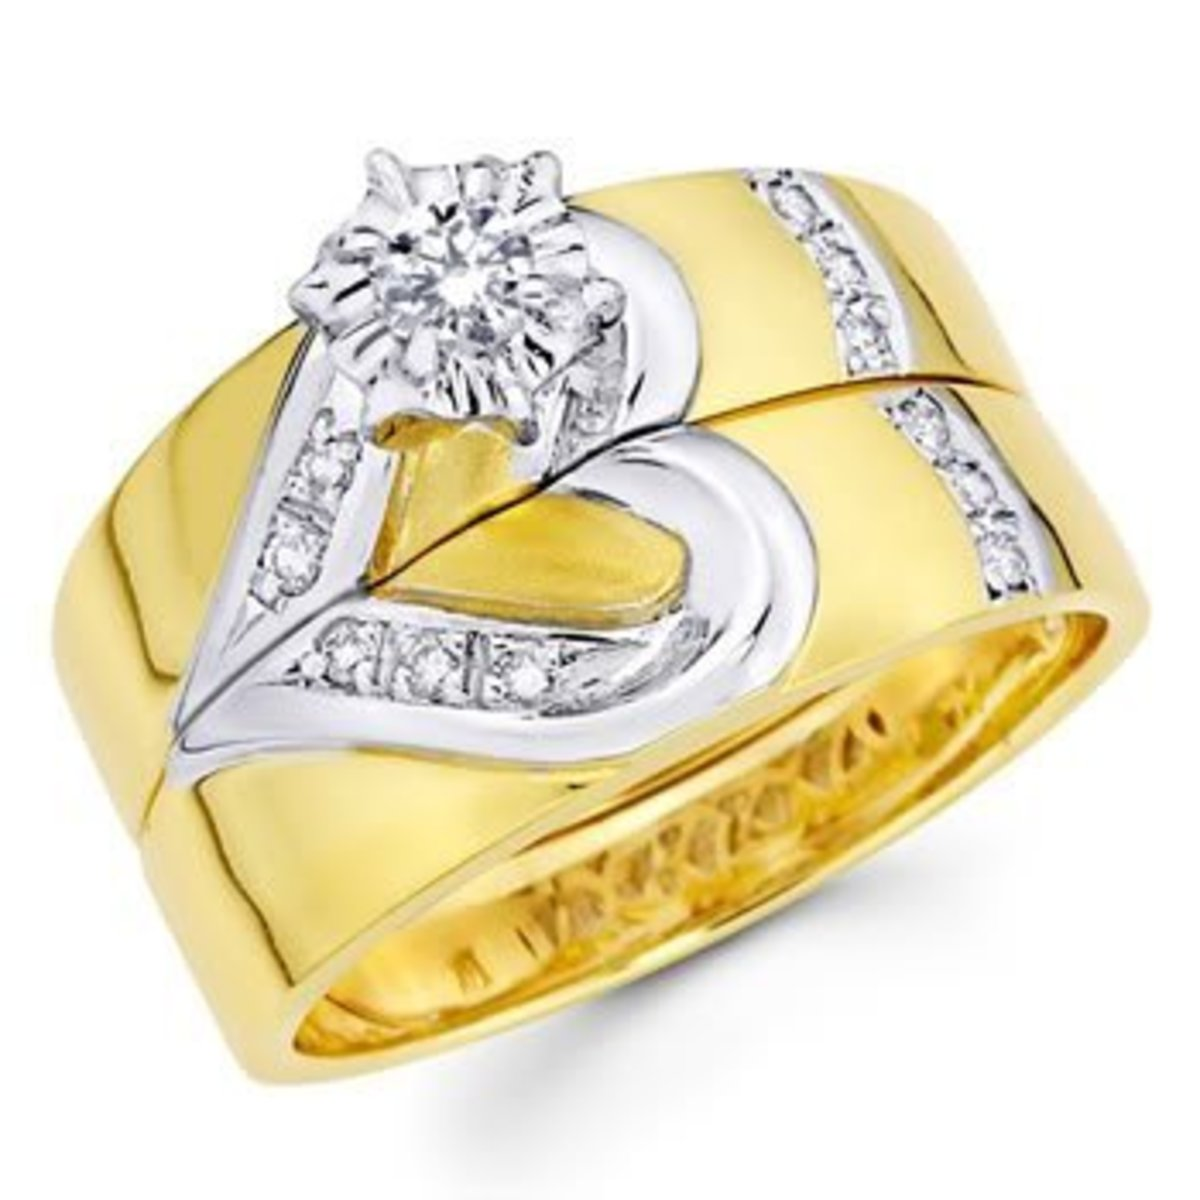 14 K Yellow Gold Diamond Ring set